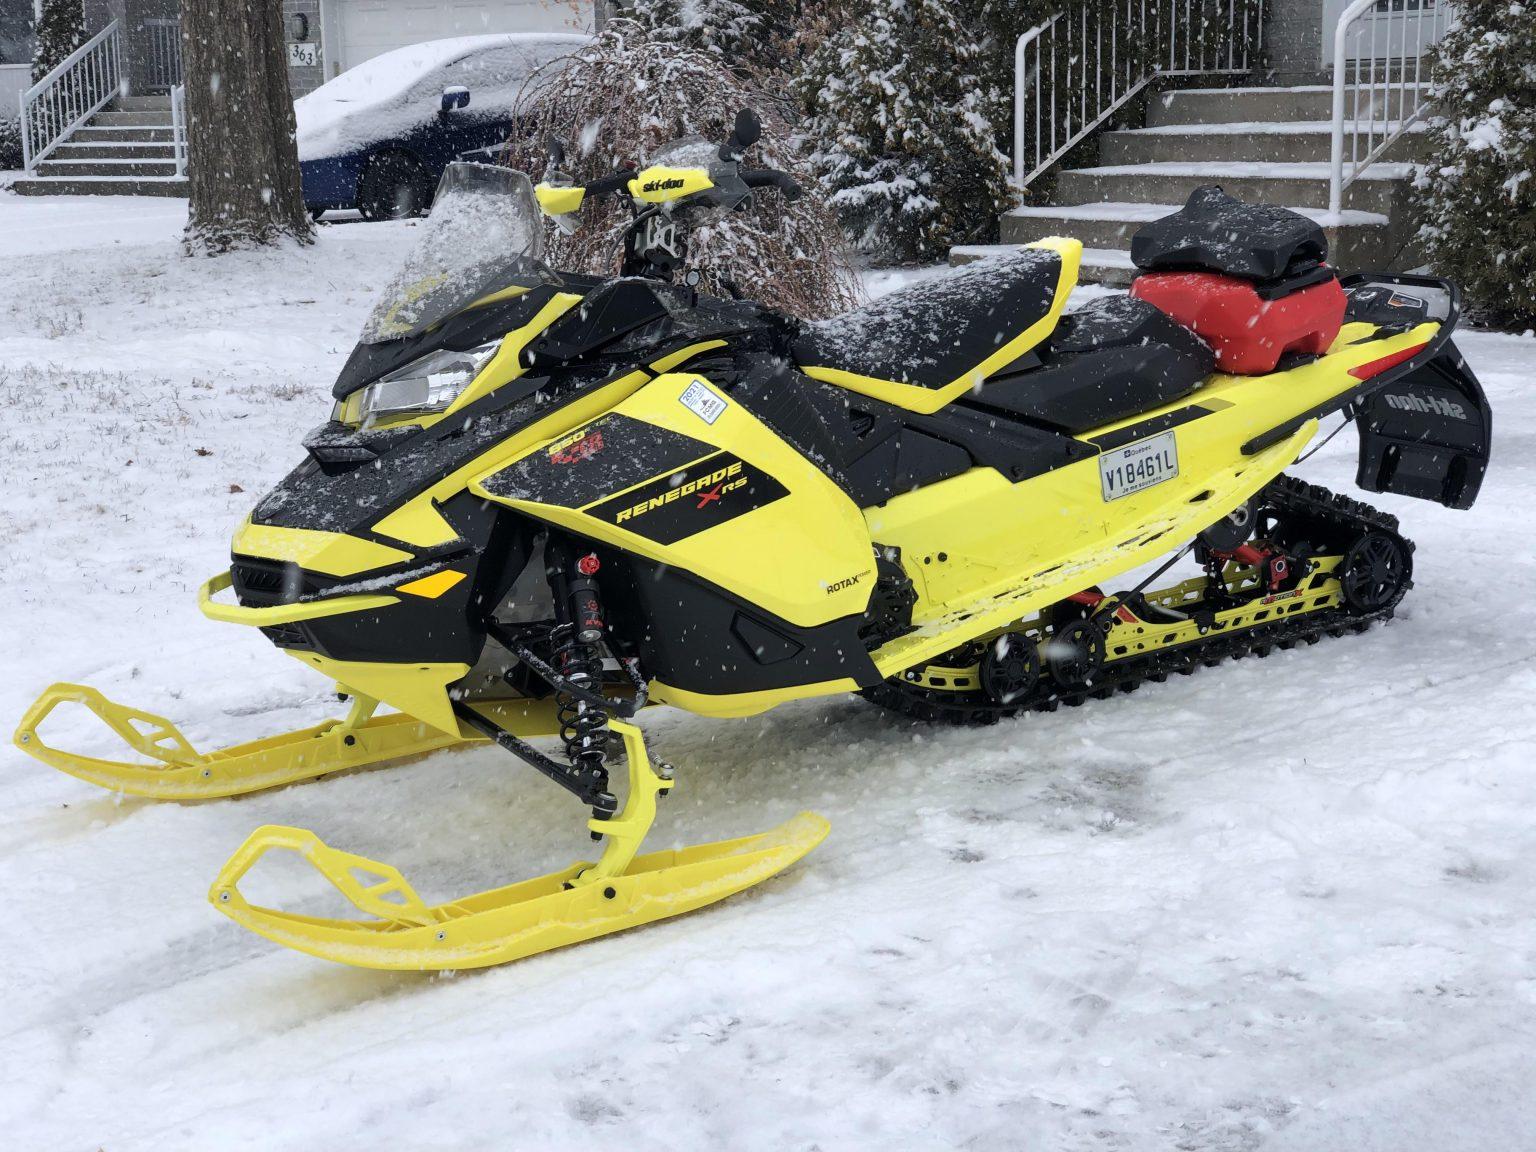 Ski-Doo Renegade X-RS 850 E-TEC 2021 – Analyse pré-randonnée